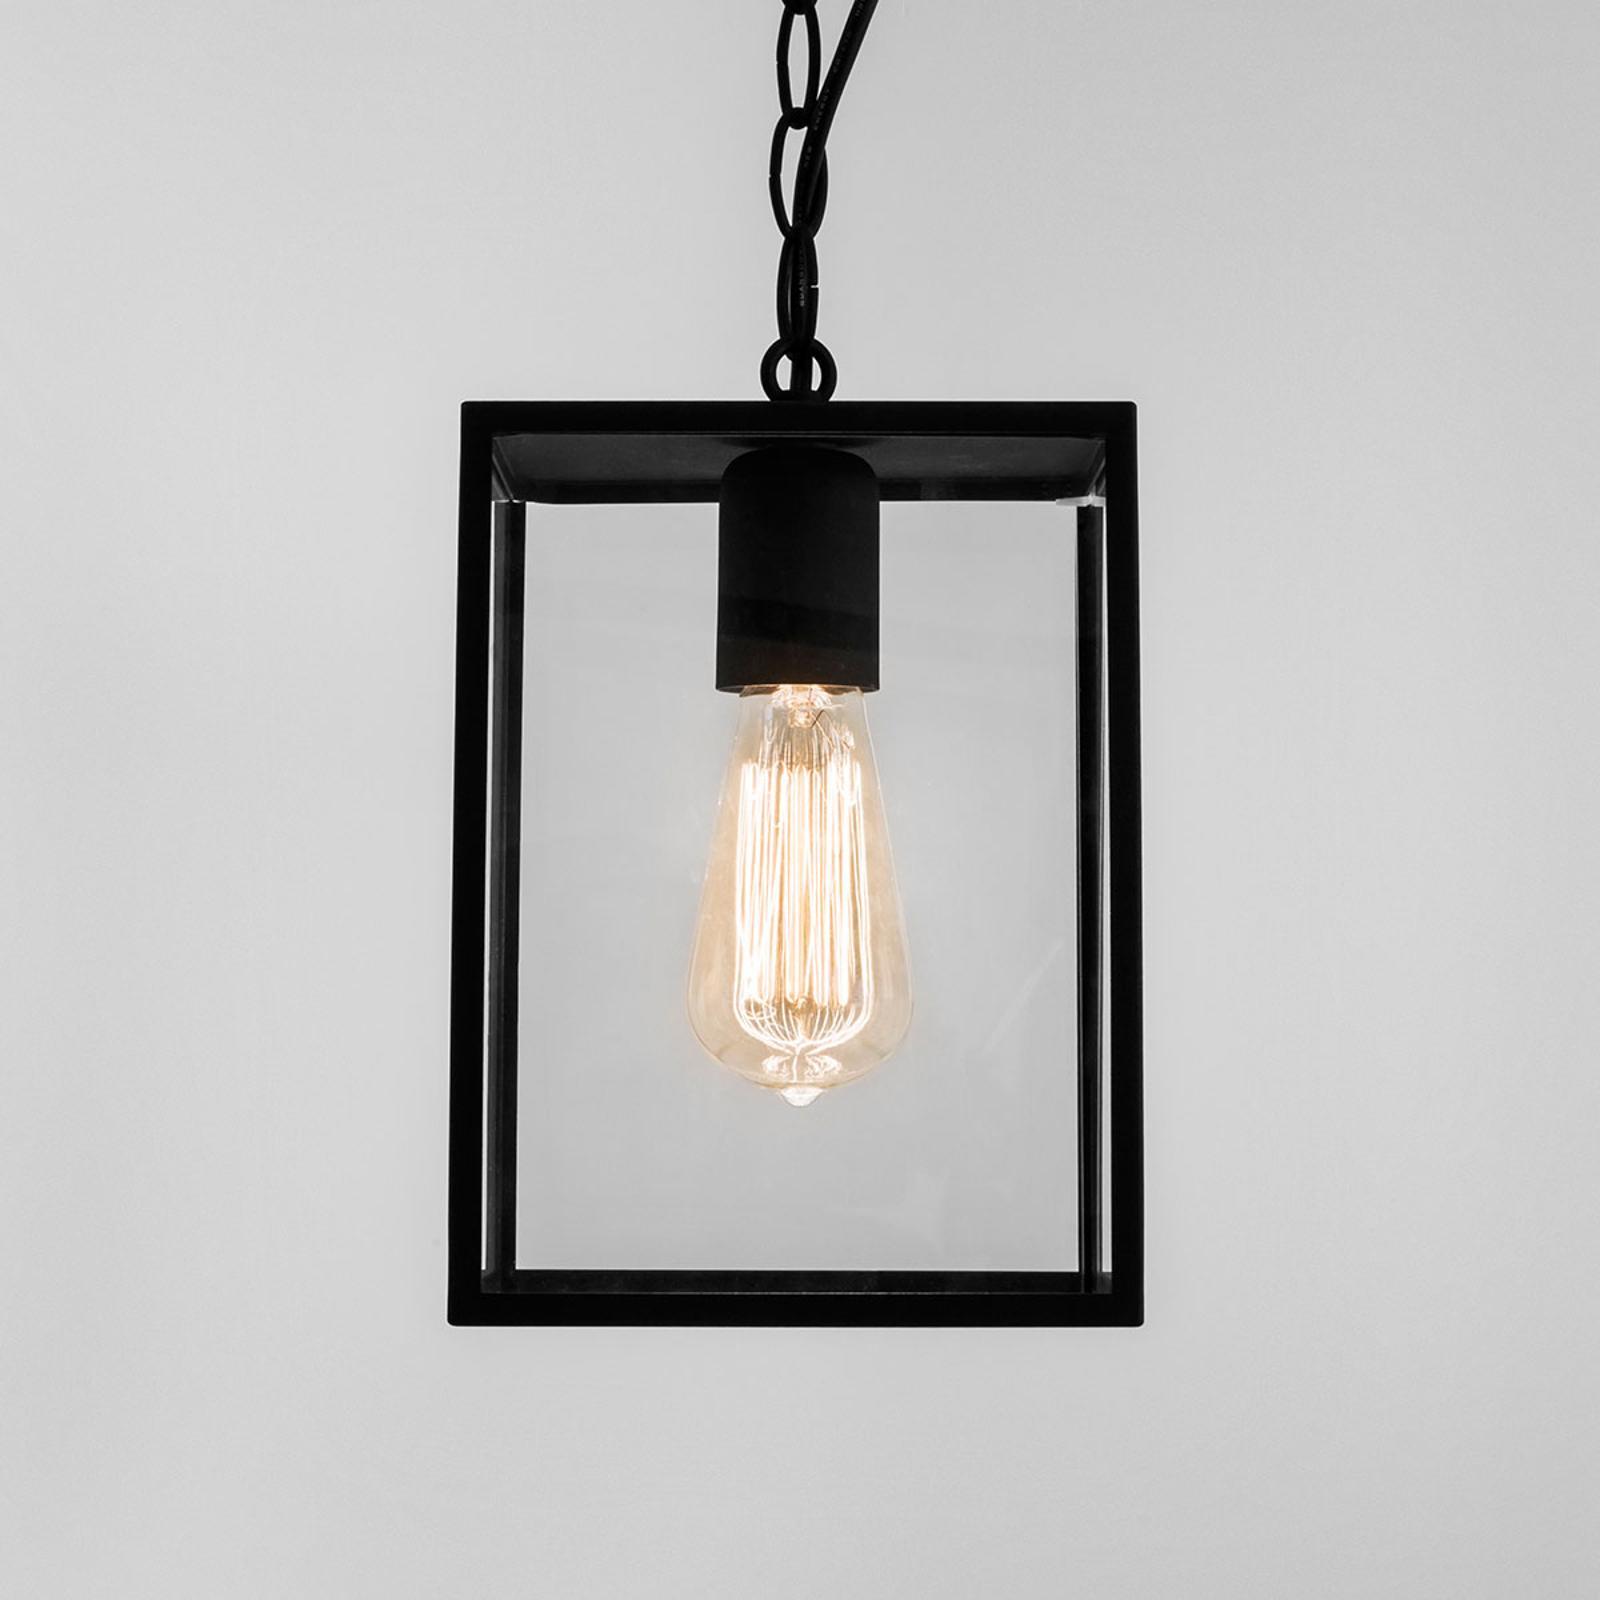 Homefield Pendant Outside Hanging Light_1020501_1